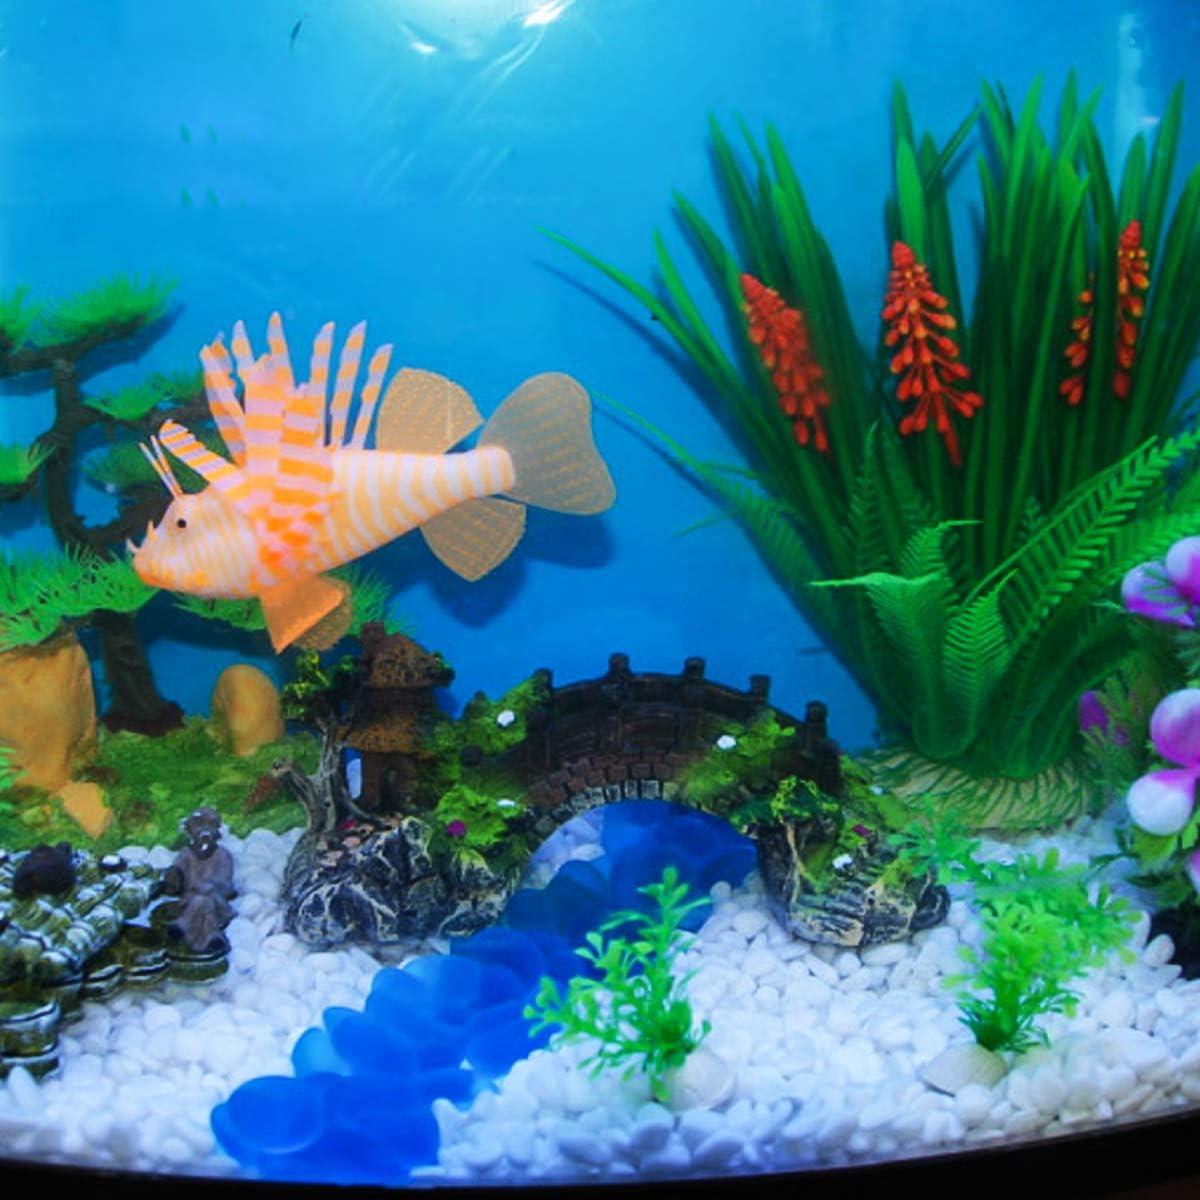 Yesbaby Aquarium Decoration Rockery Bridge Fake Rock Bridge DIY Fish Tank Ornament XL